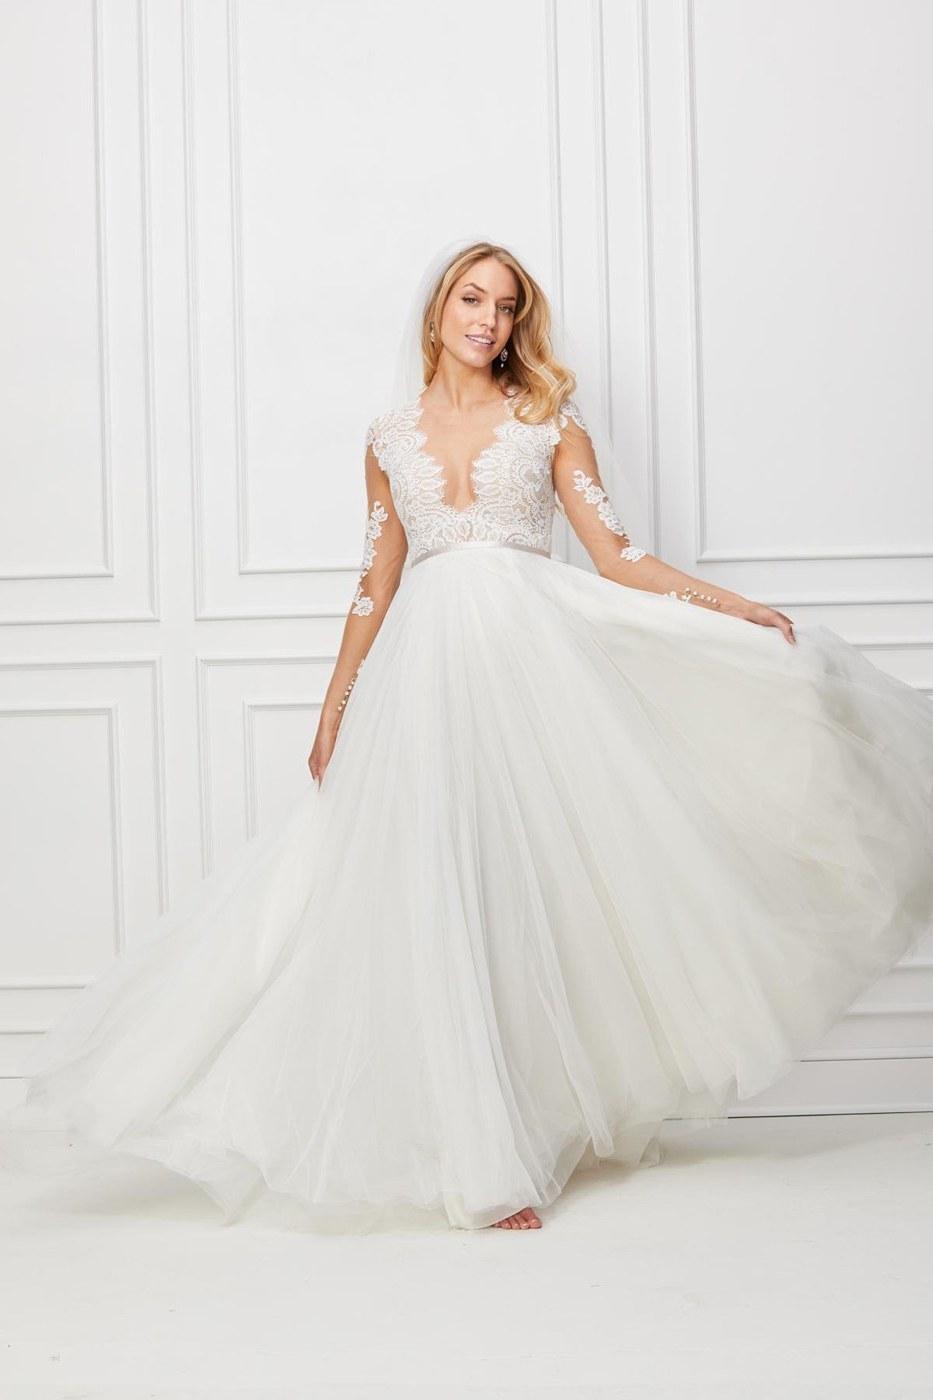 Ide Long Dress Bridesmaid Hijab D0dg Wtoo Camden Long Sleeve Bridal Gown